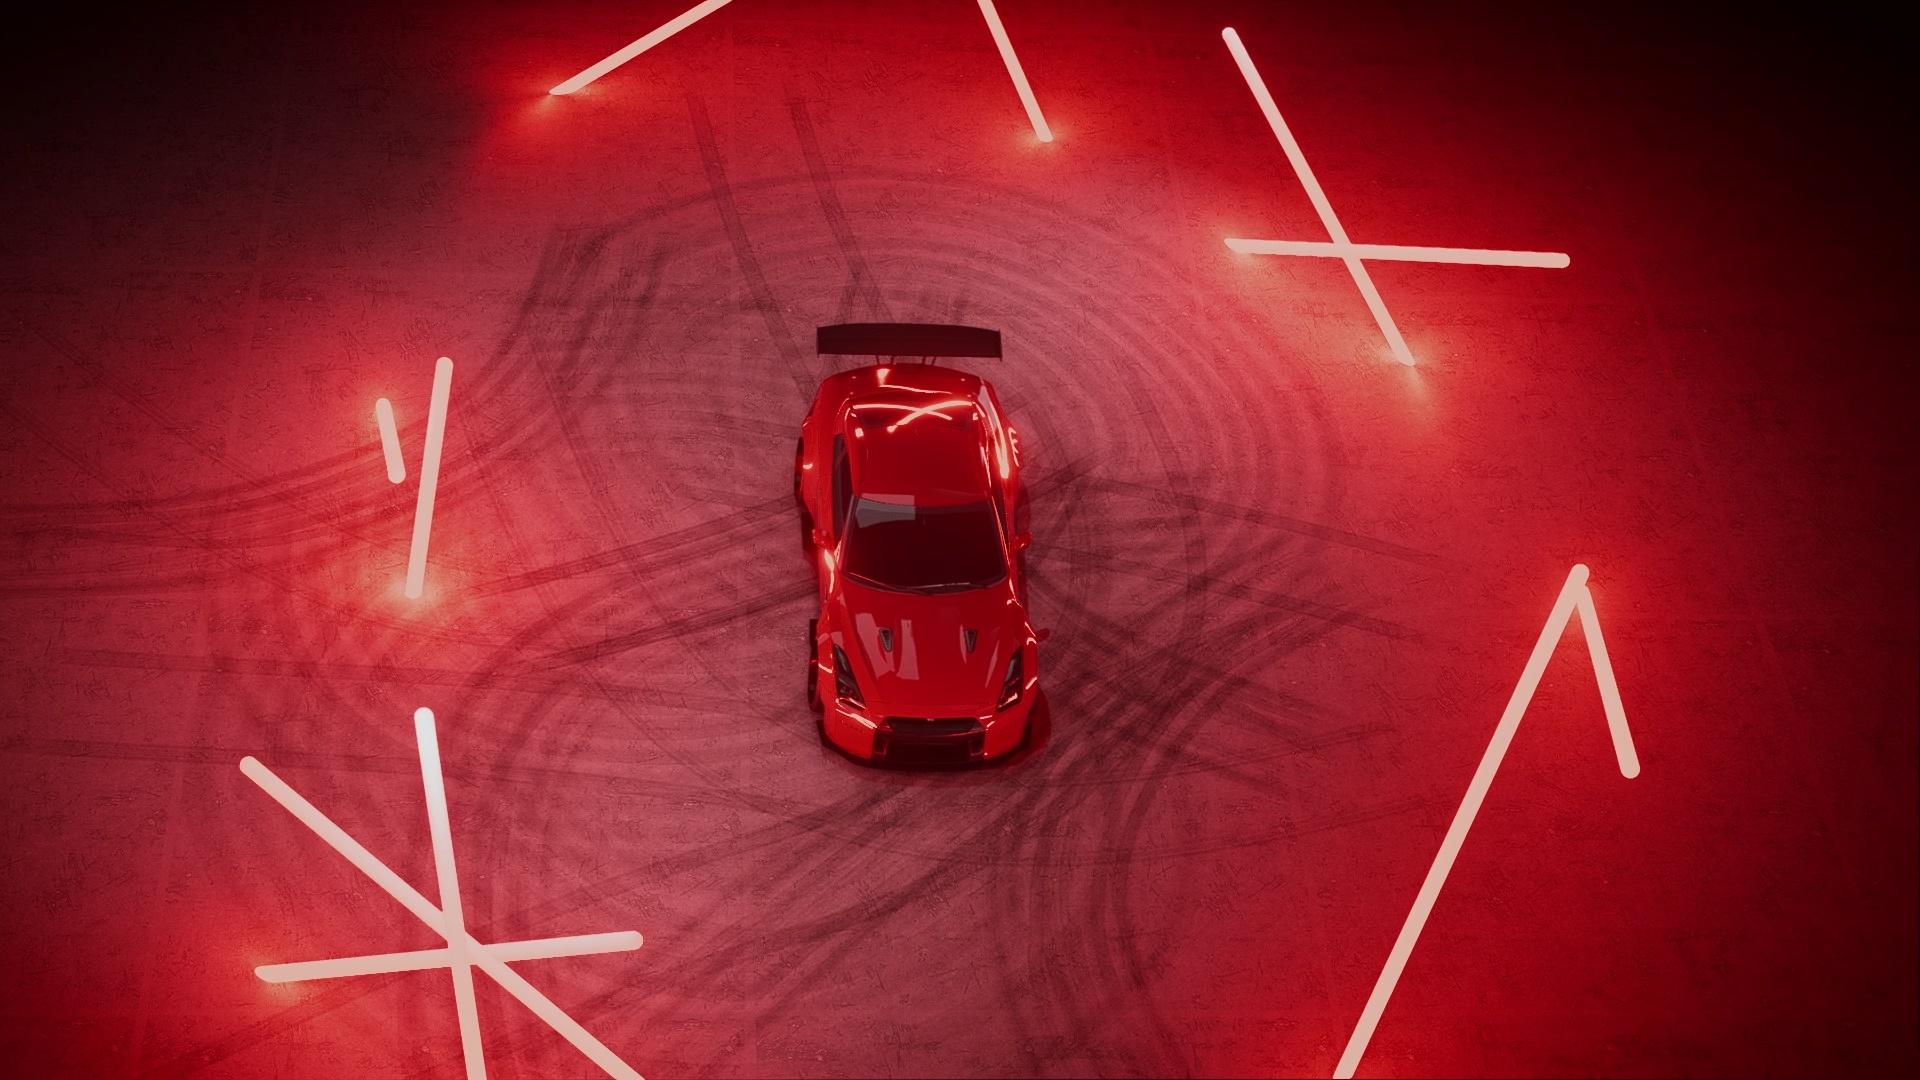 Nissan GT-R R35 RED THEME wallpaper